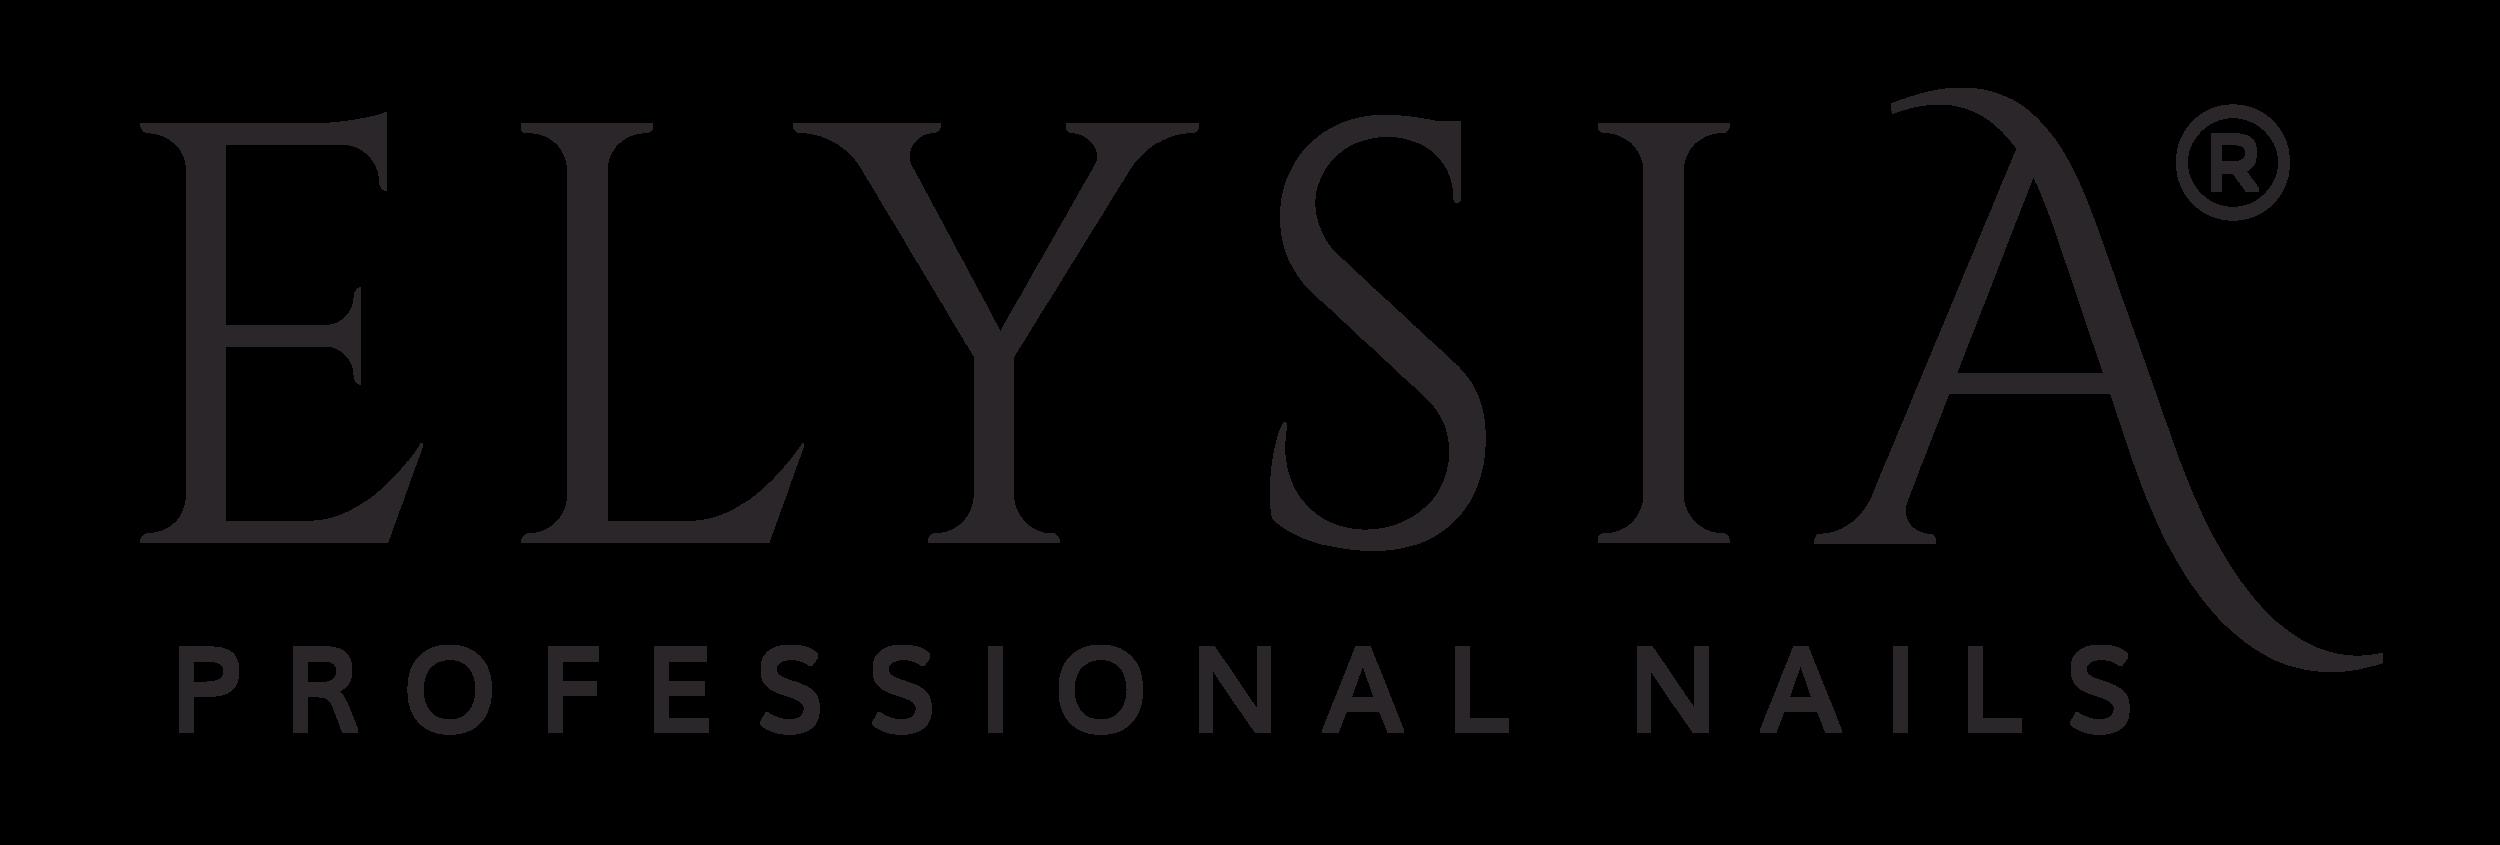 Elysia Professional Nails - France